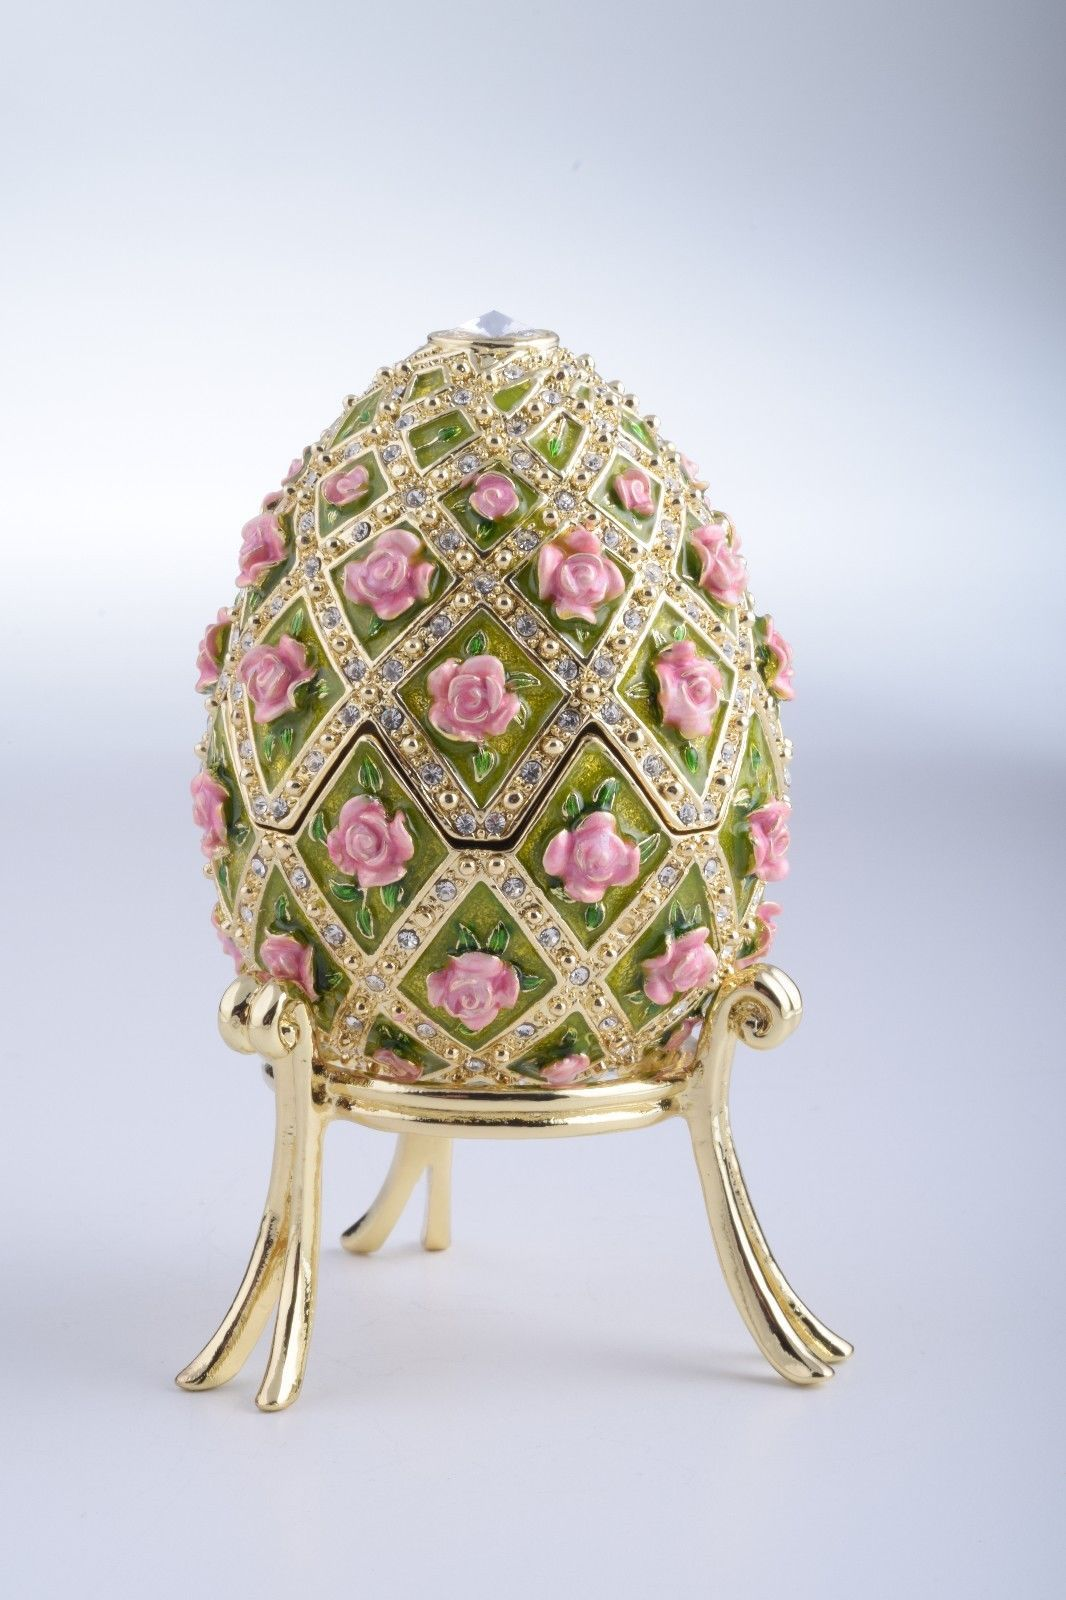 Egg with roses & MusicTrinket Box by Keren Kopal Faberge Egg Austrian Crystal